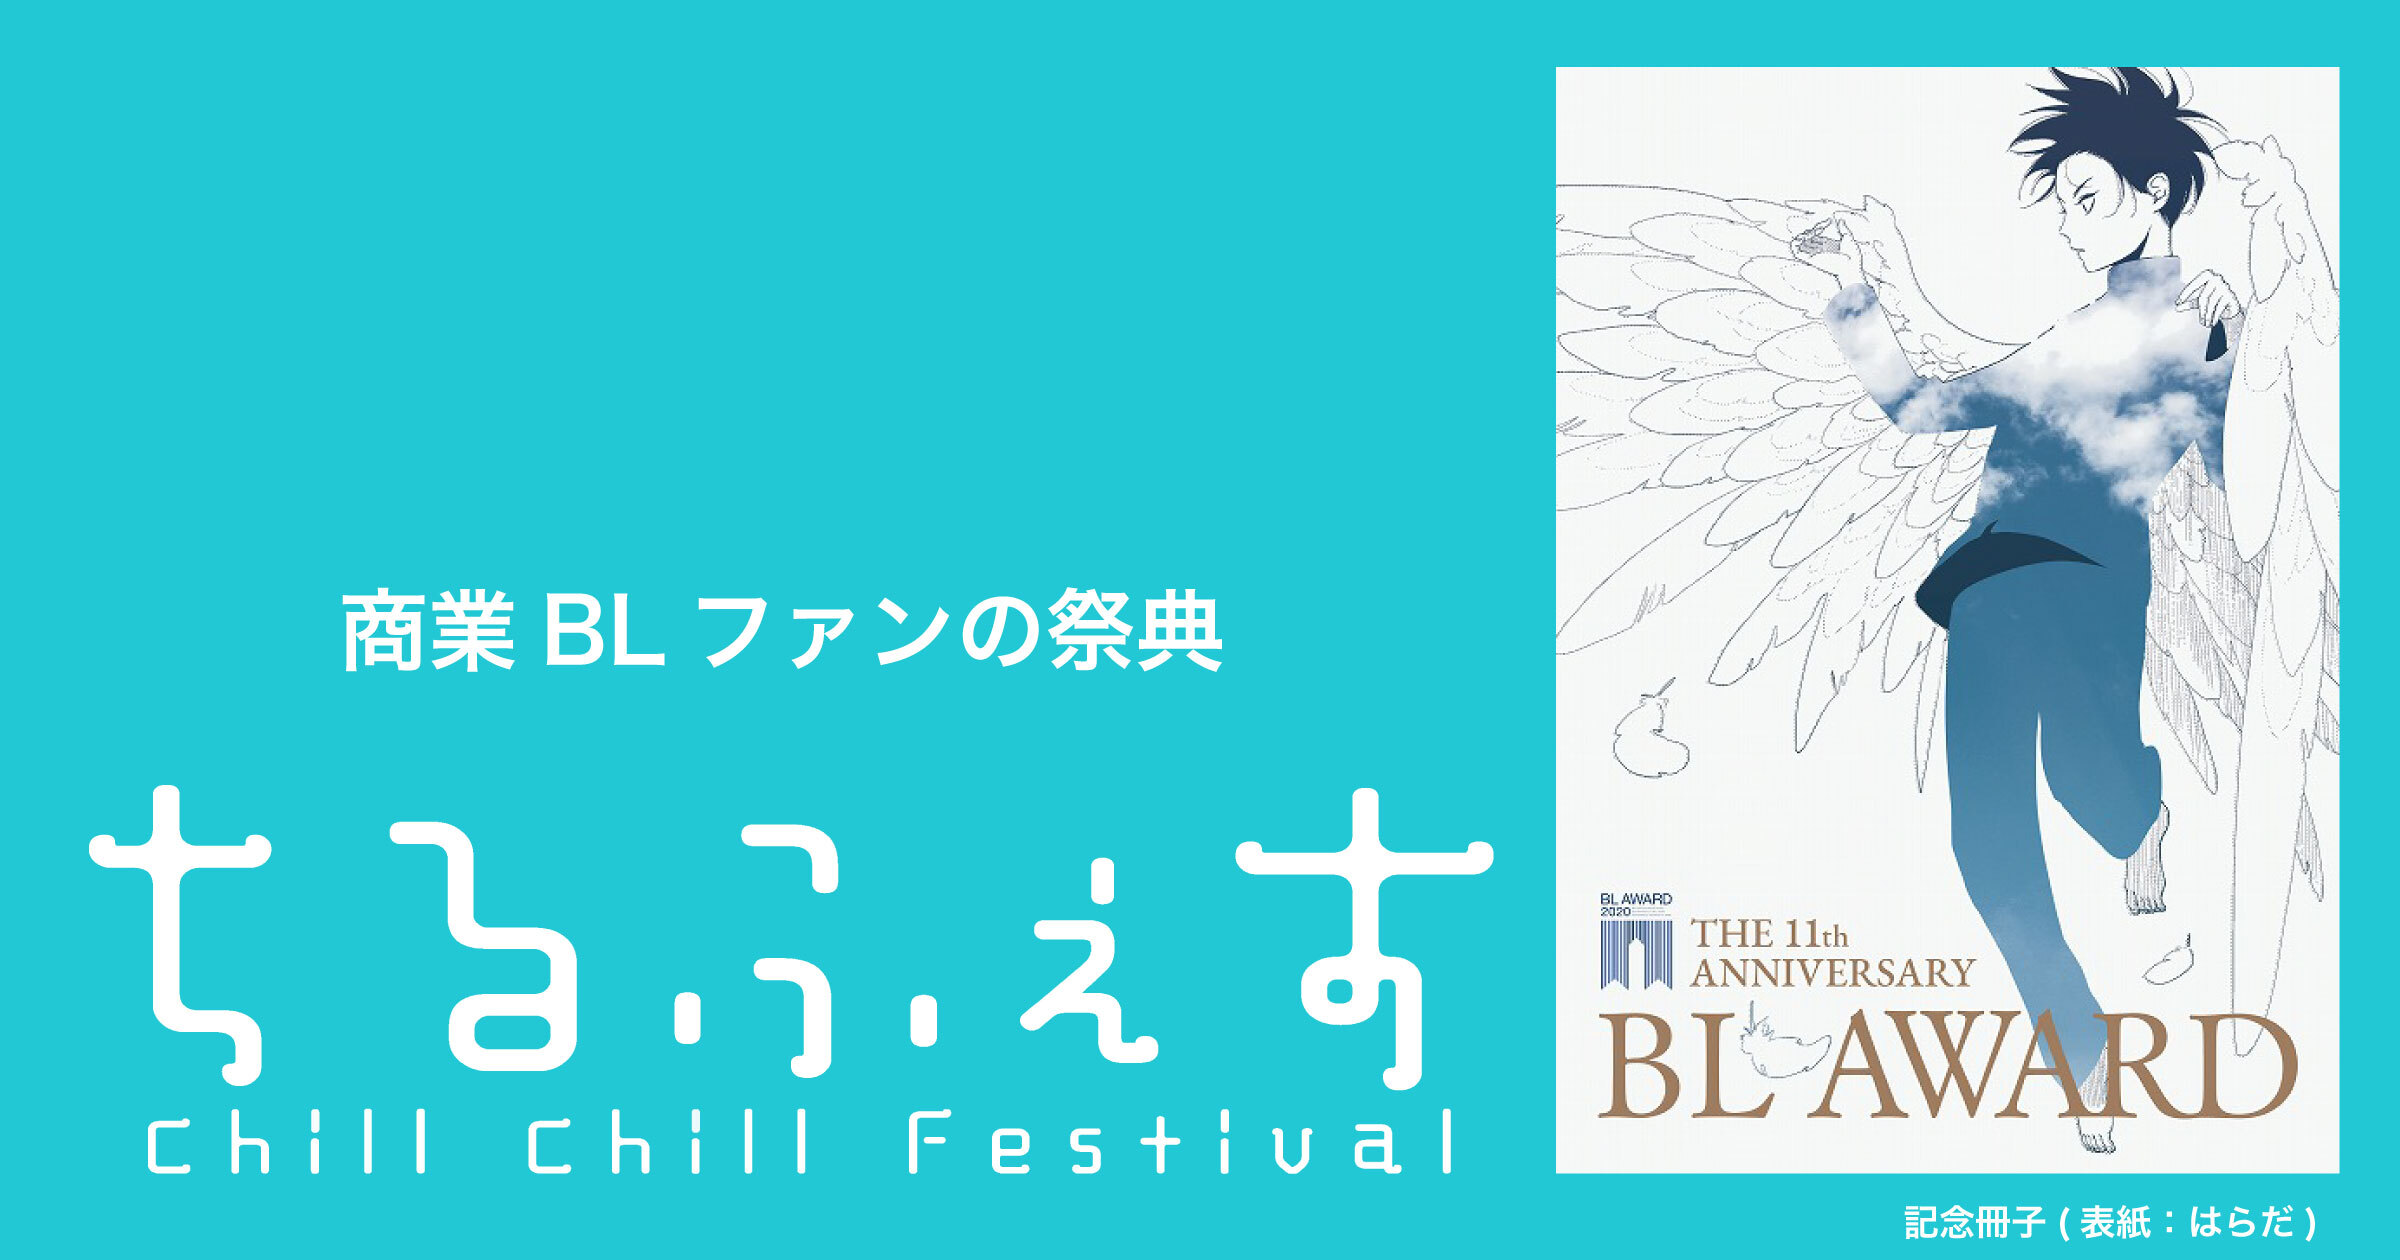 【CHILL CHILL FESTIVAL 3rd】7月18日サイン本販売抽選整理券